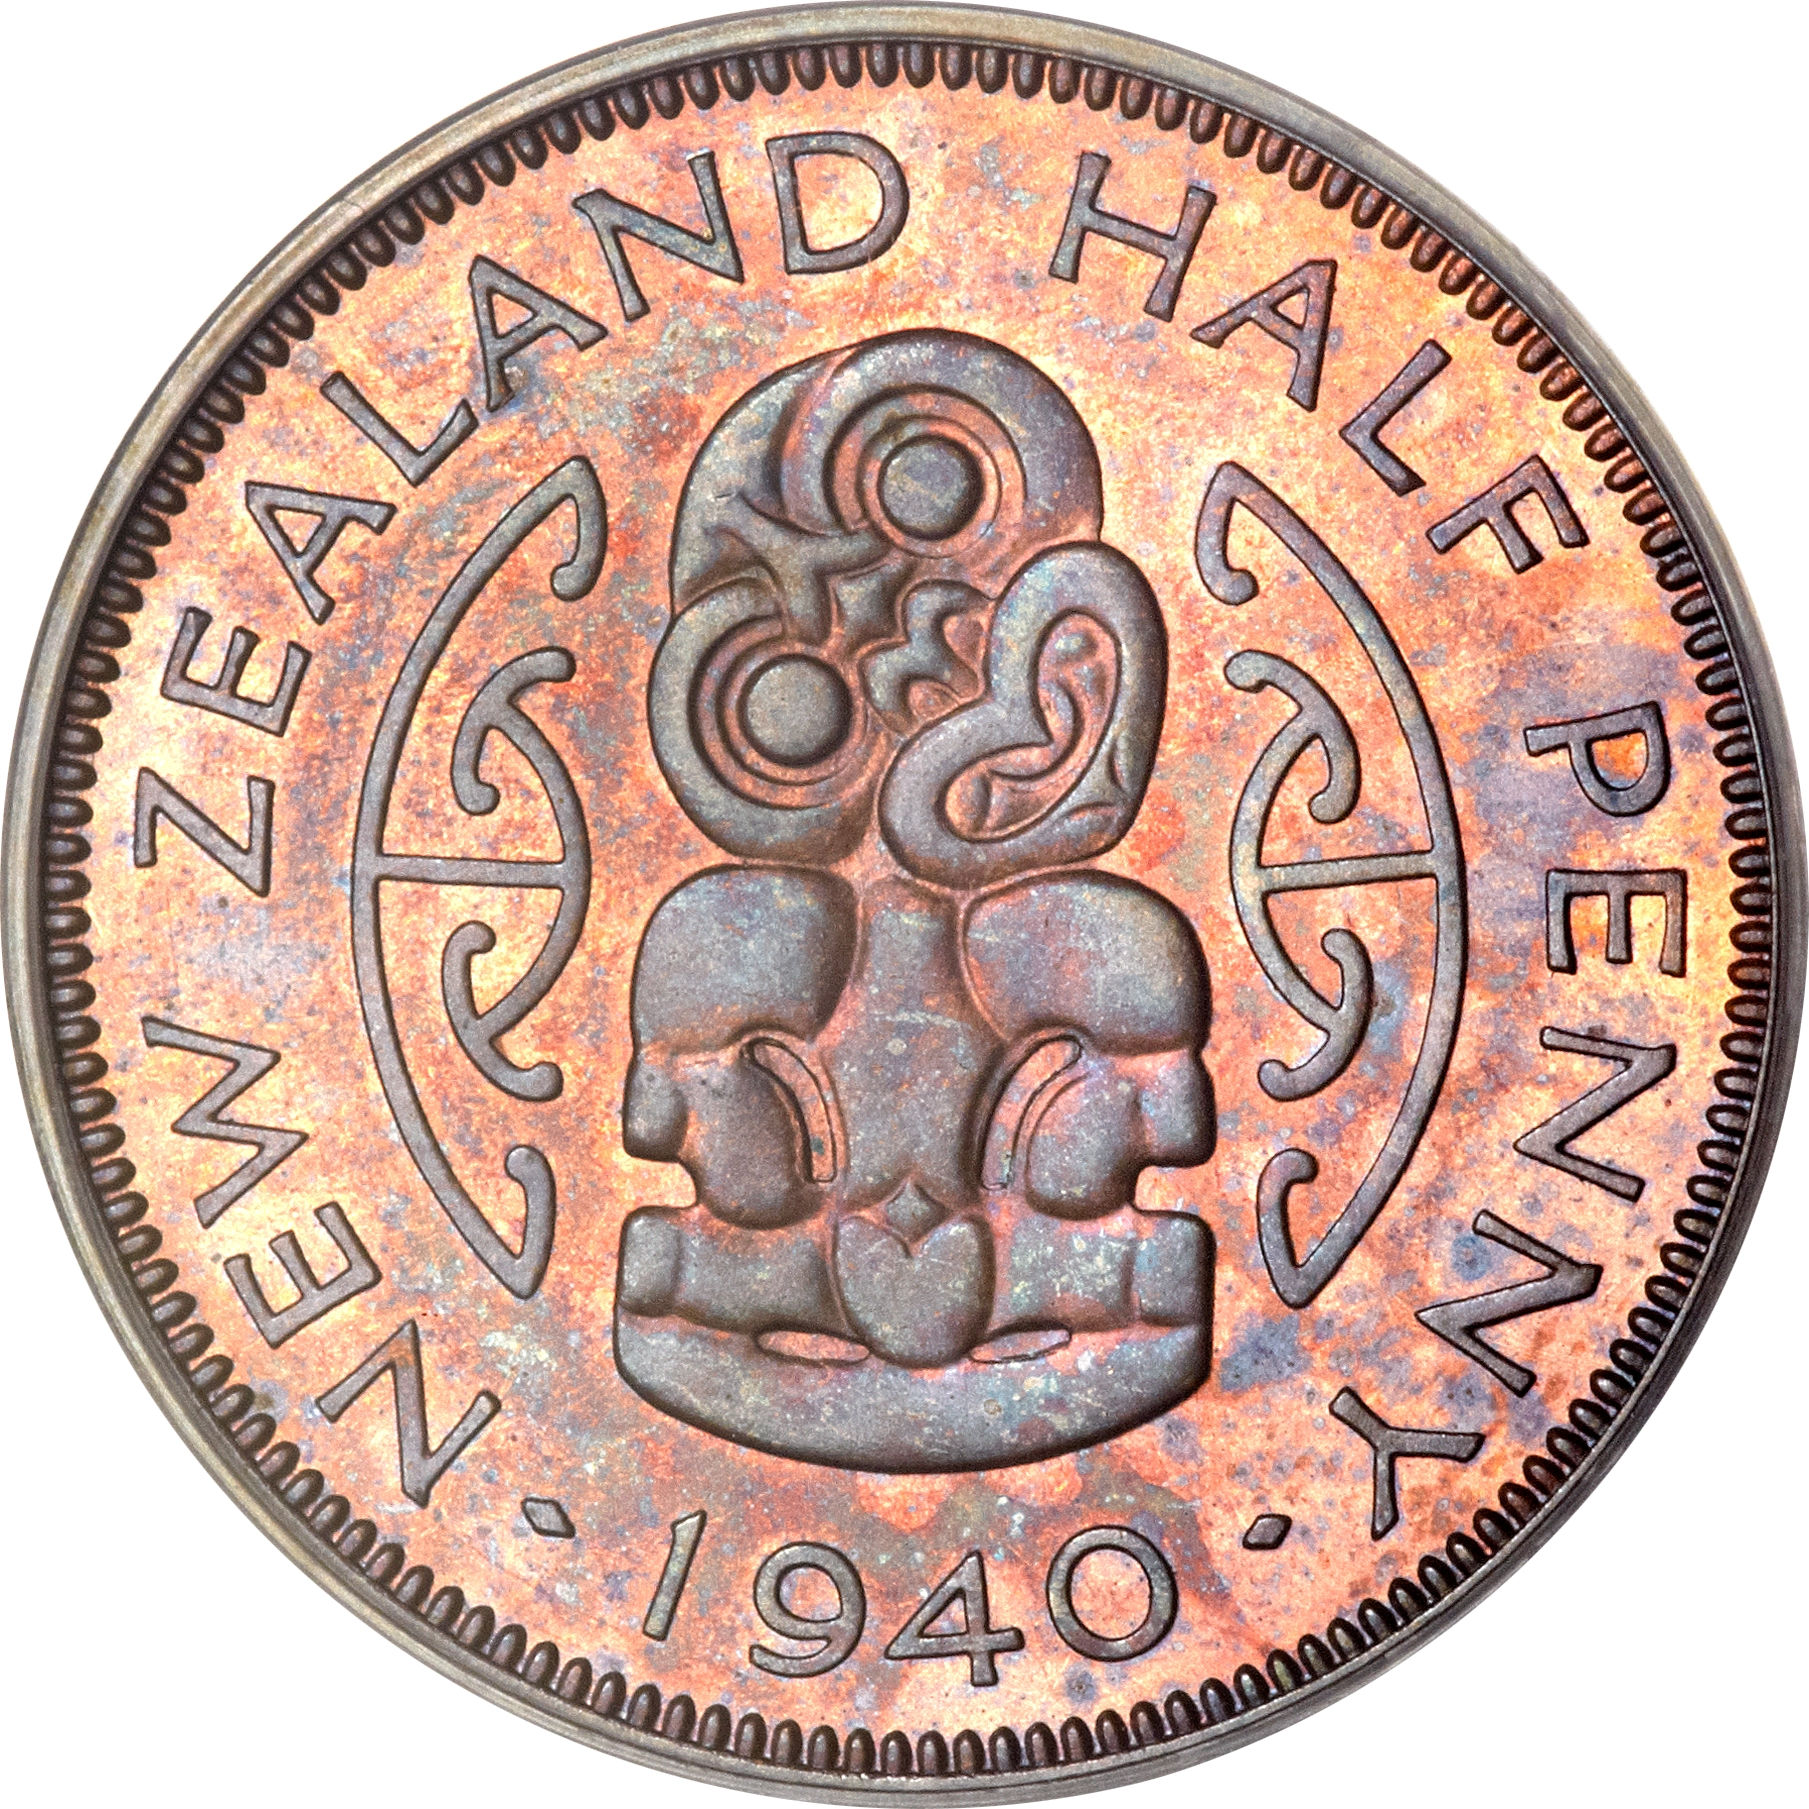 ½ Penny - George VI (1st type) - New Zealand – Numista